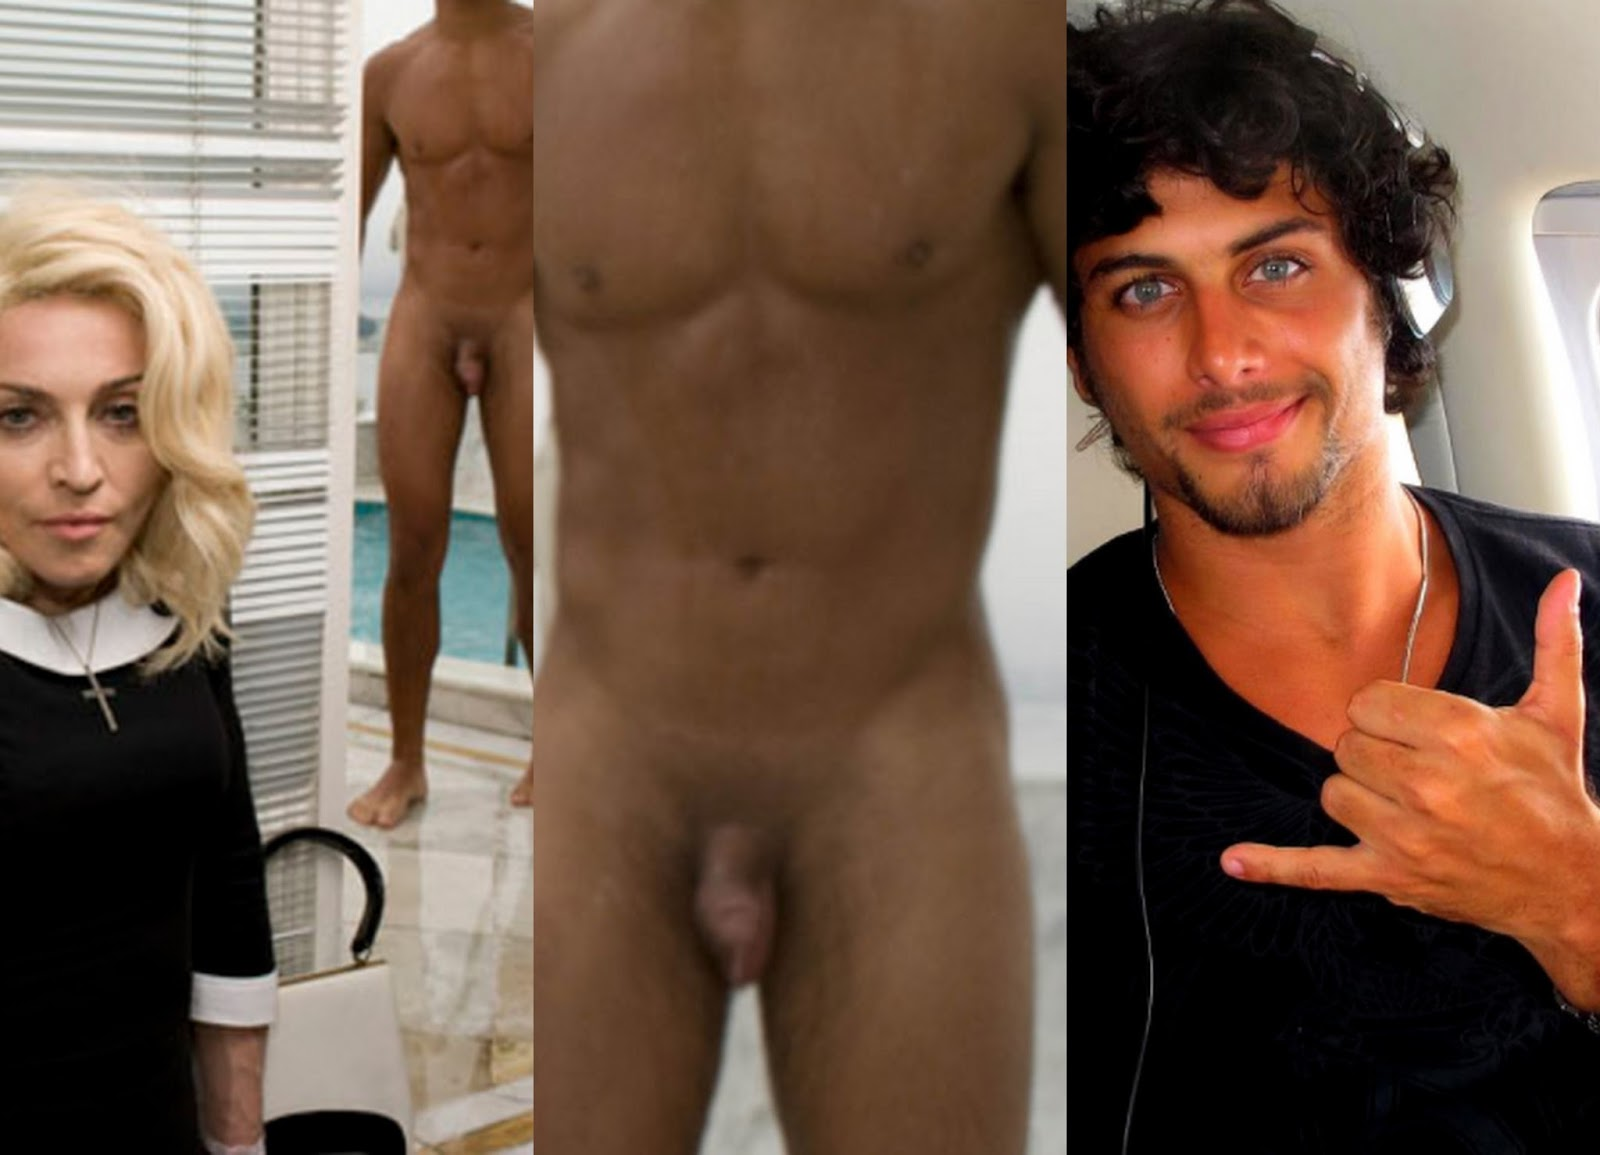 pucking nude woman hole